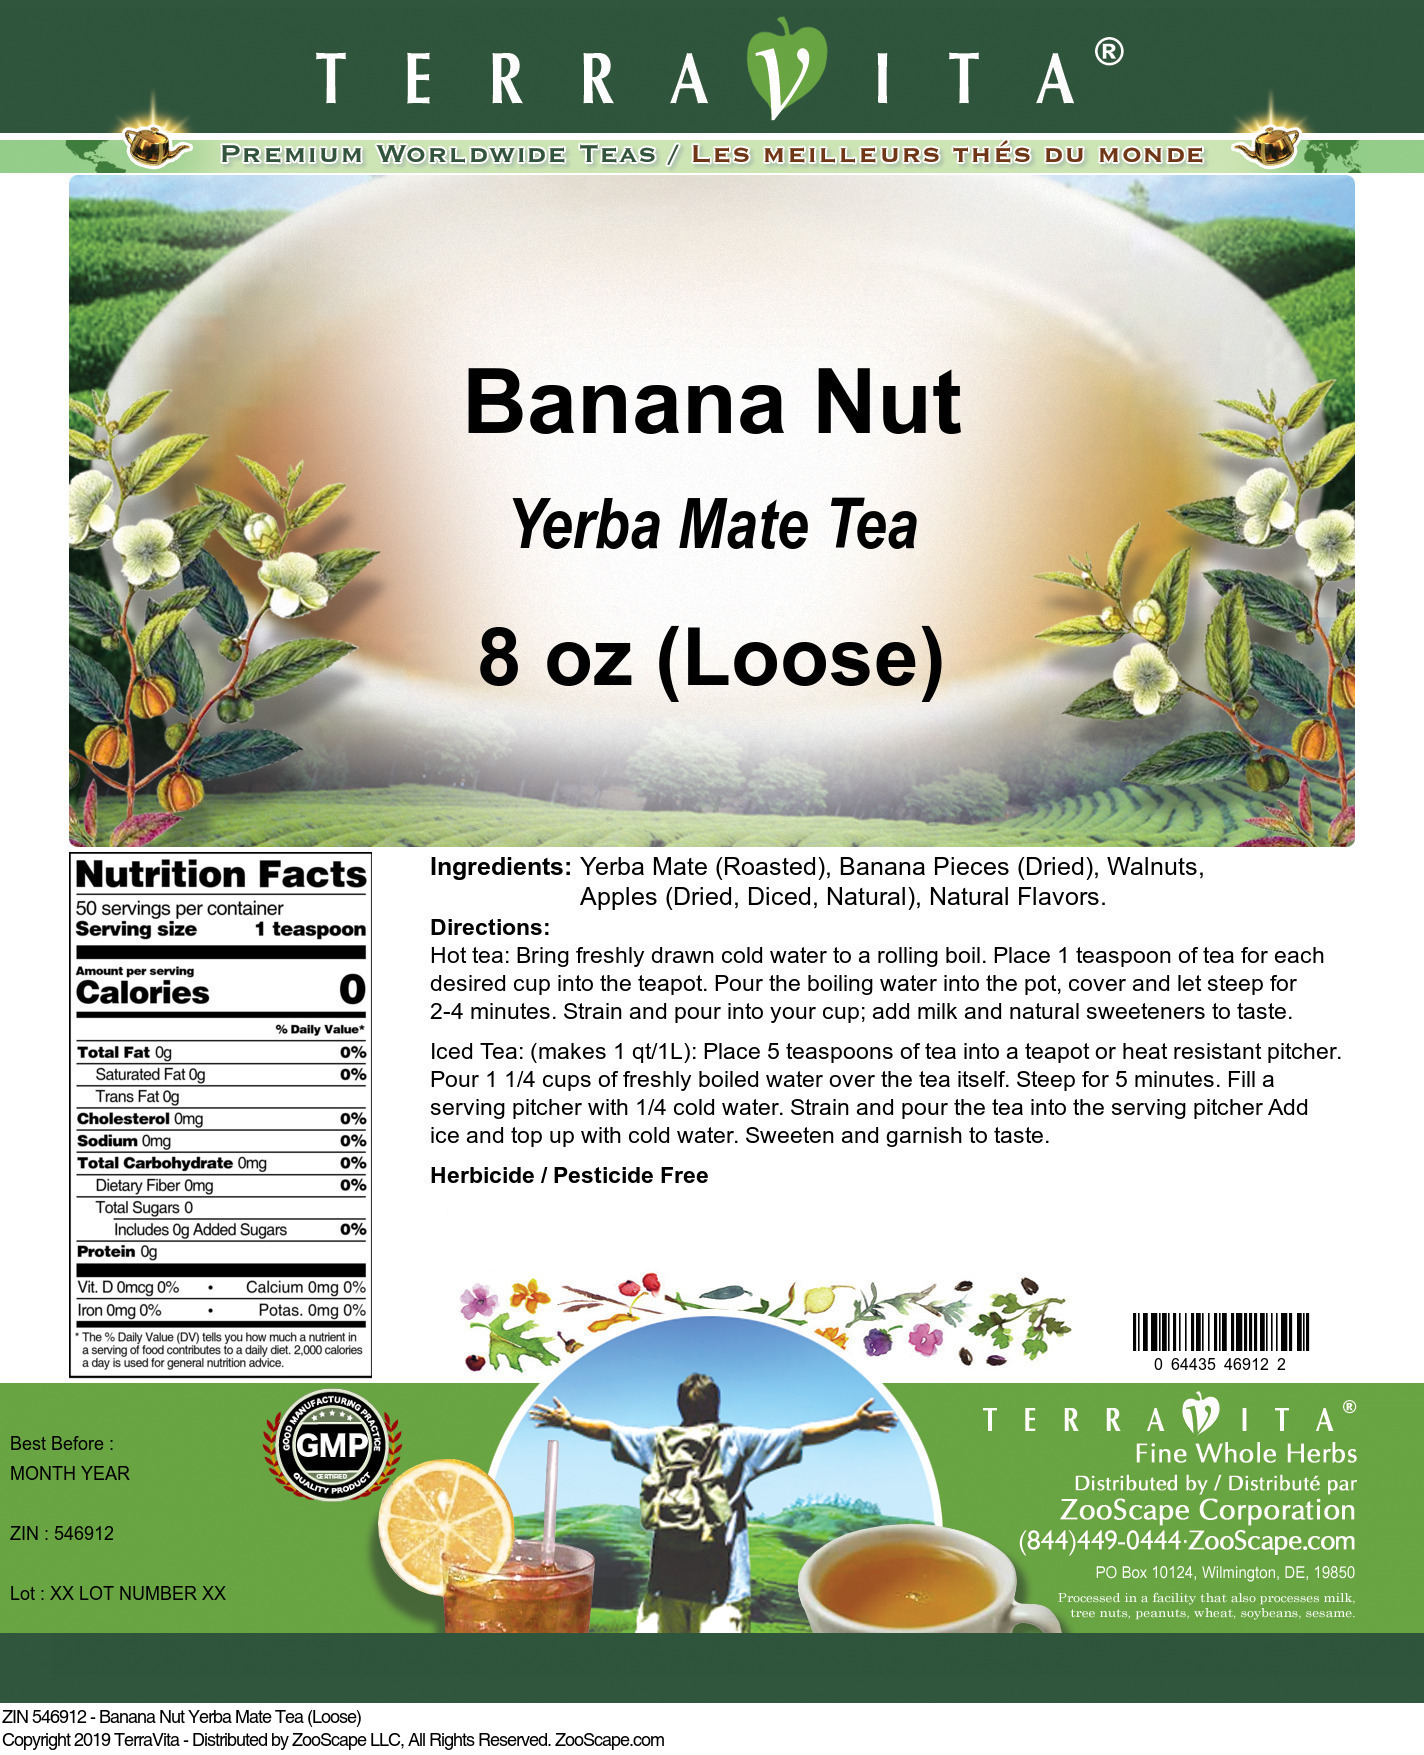 Banana Nut Yerba Mate Tea (Loose)